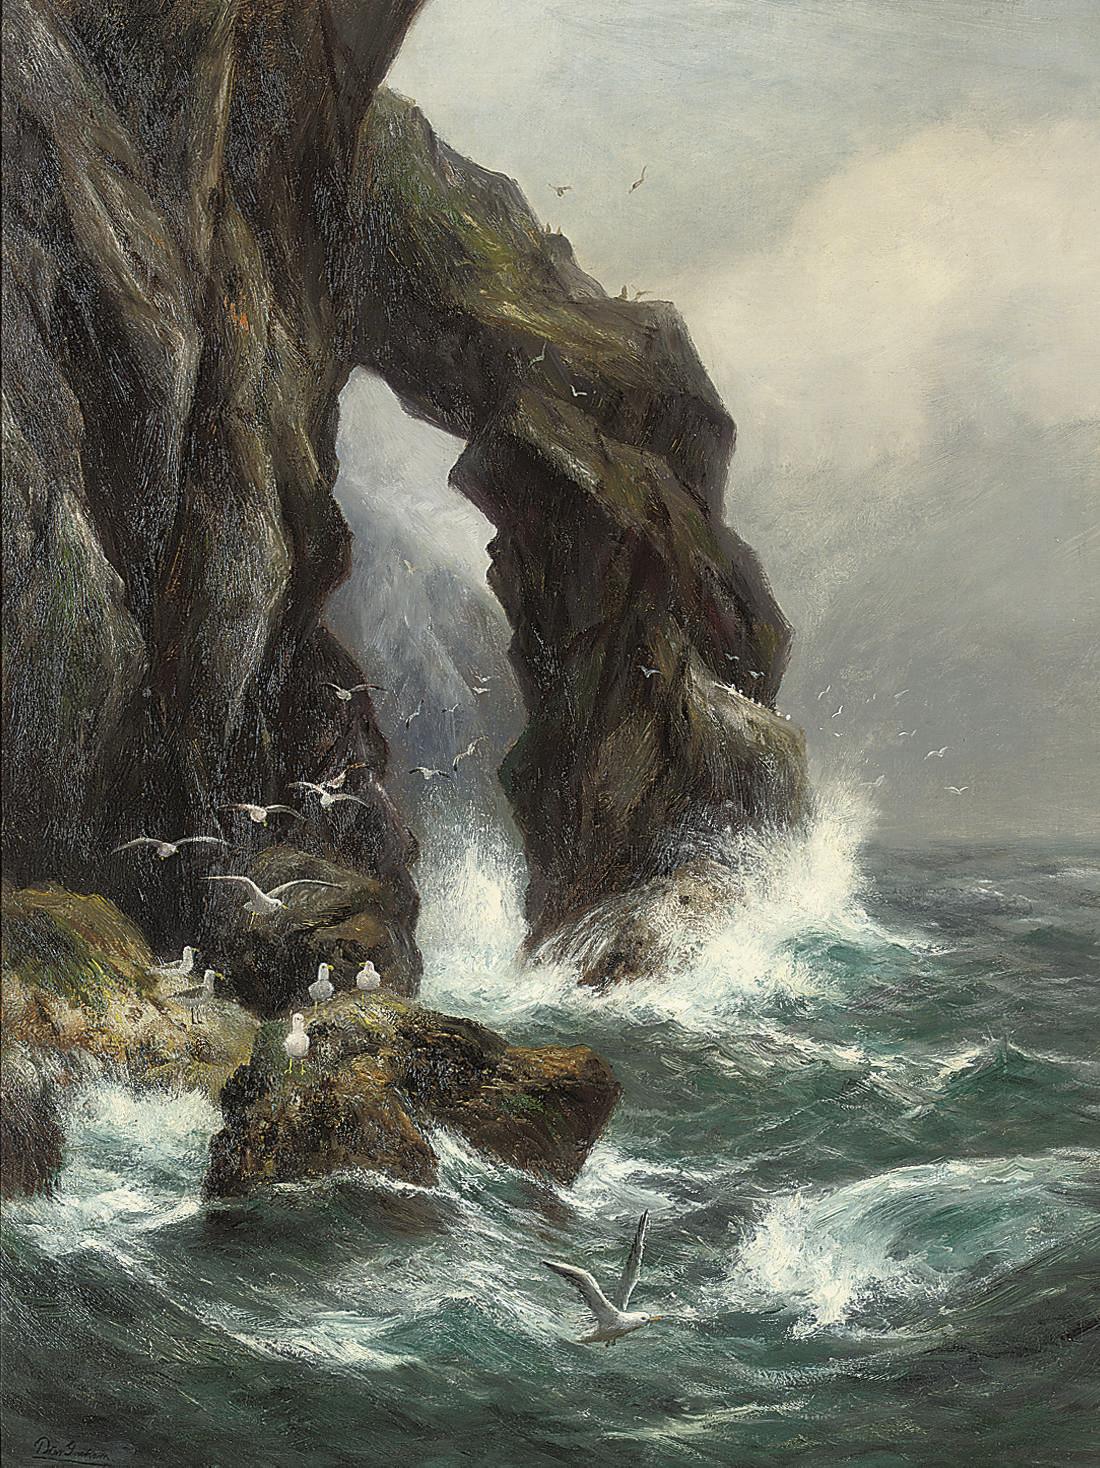 Gulls off a rocky coastline